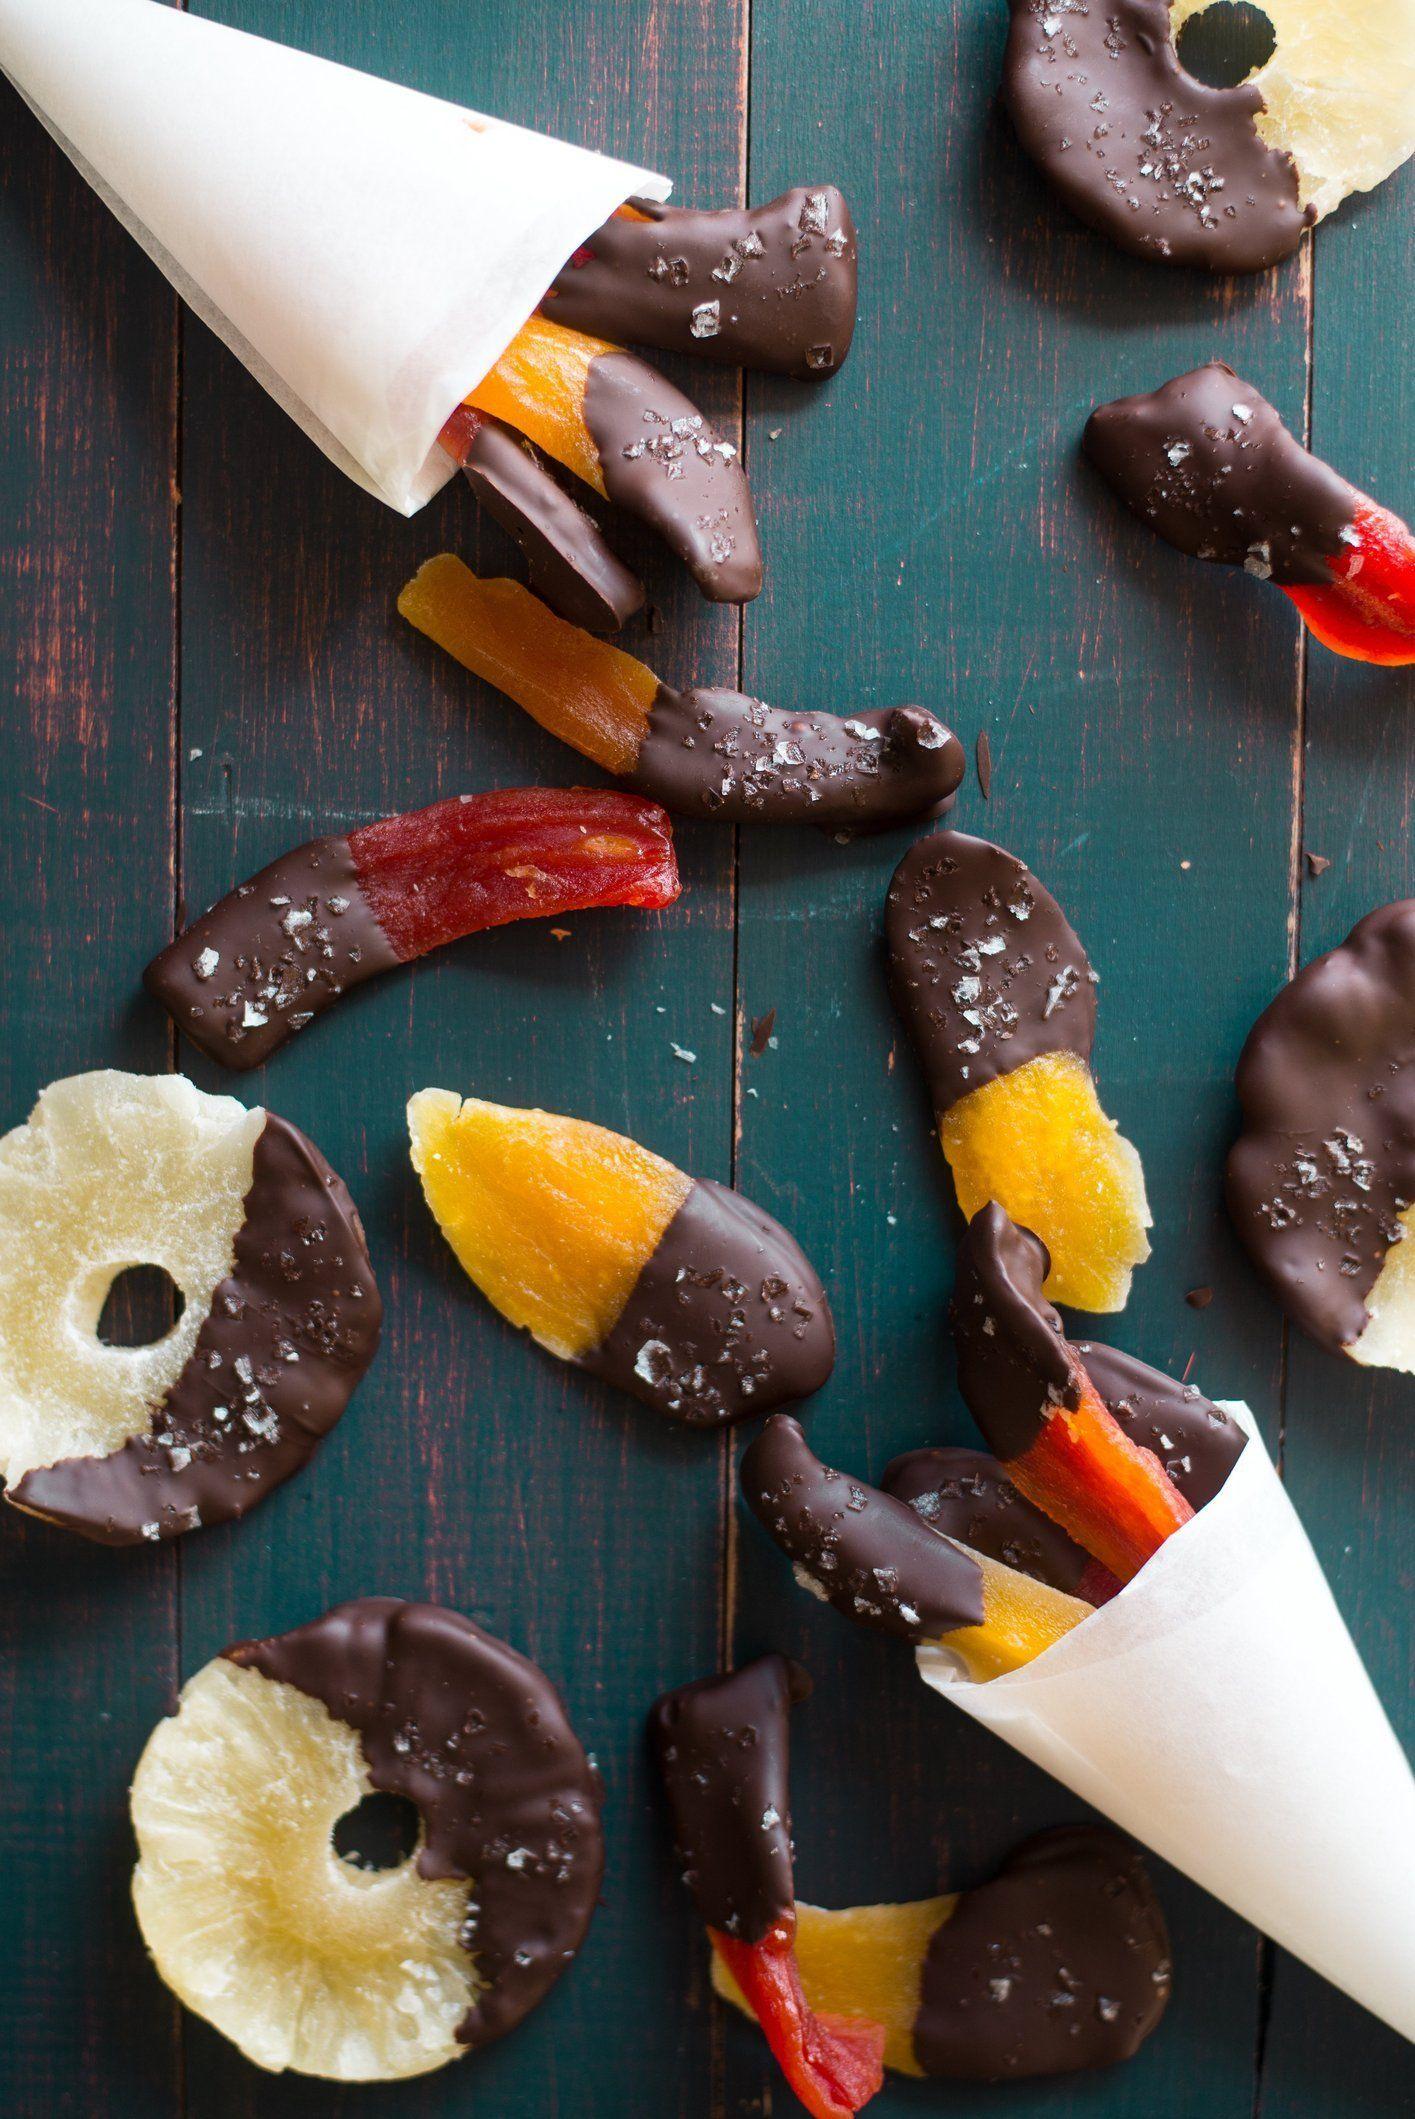 Recipe: Chile-Chocolate Tropical Fruit